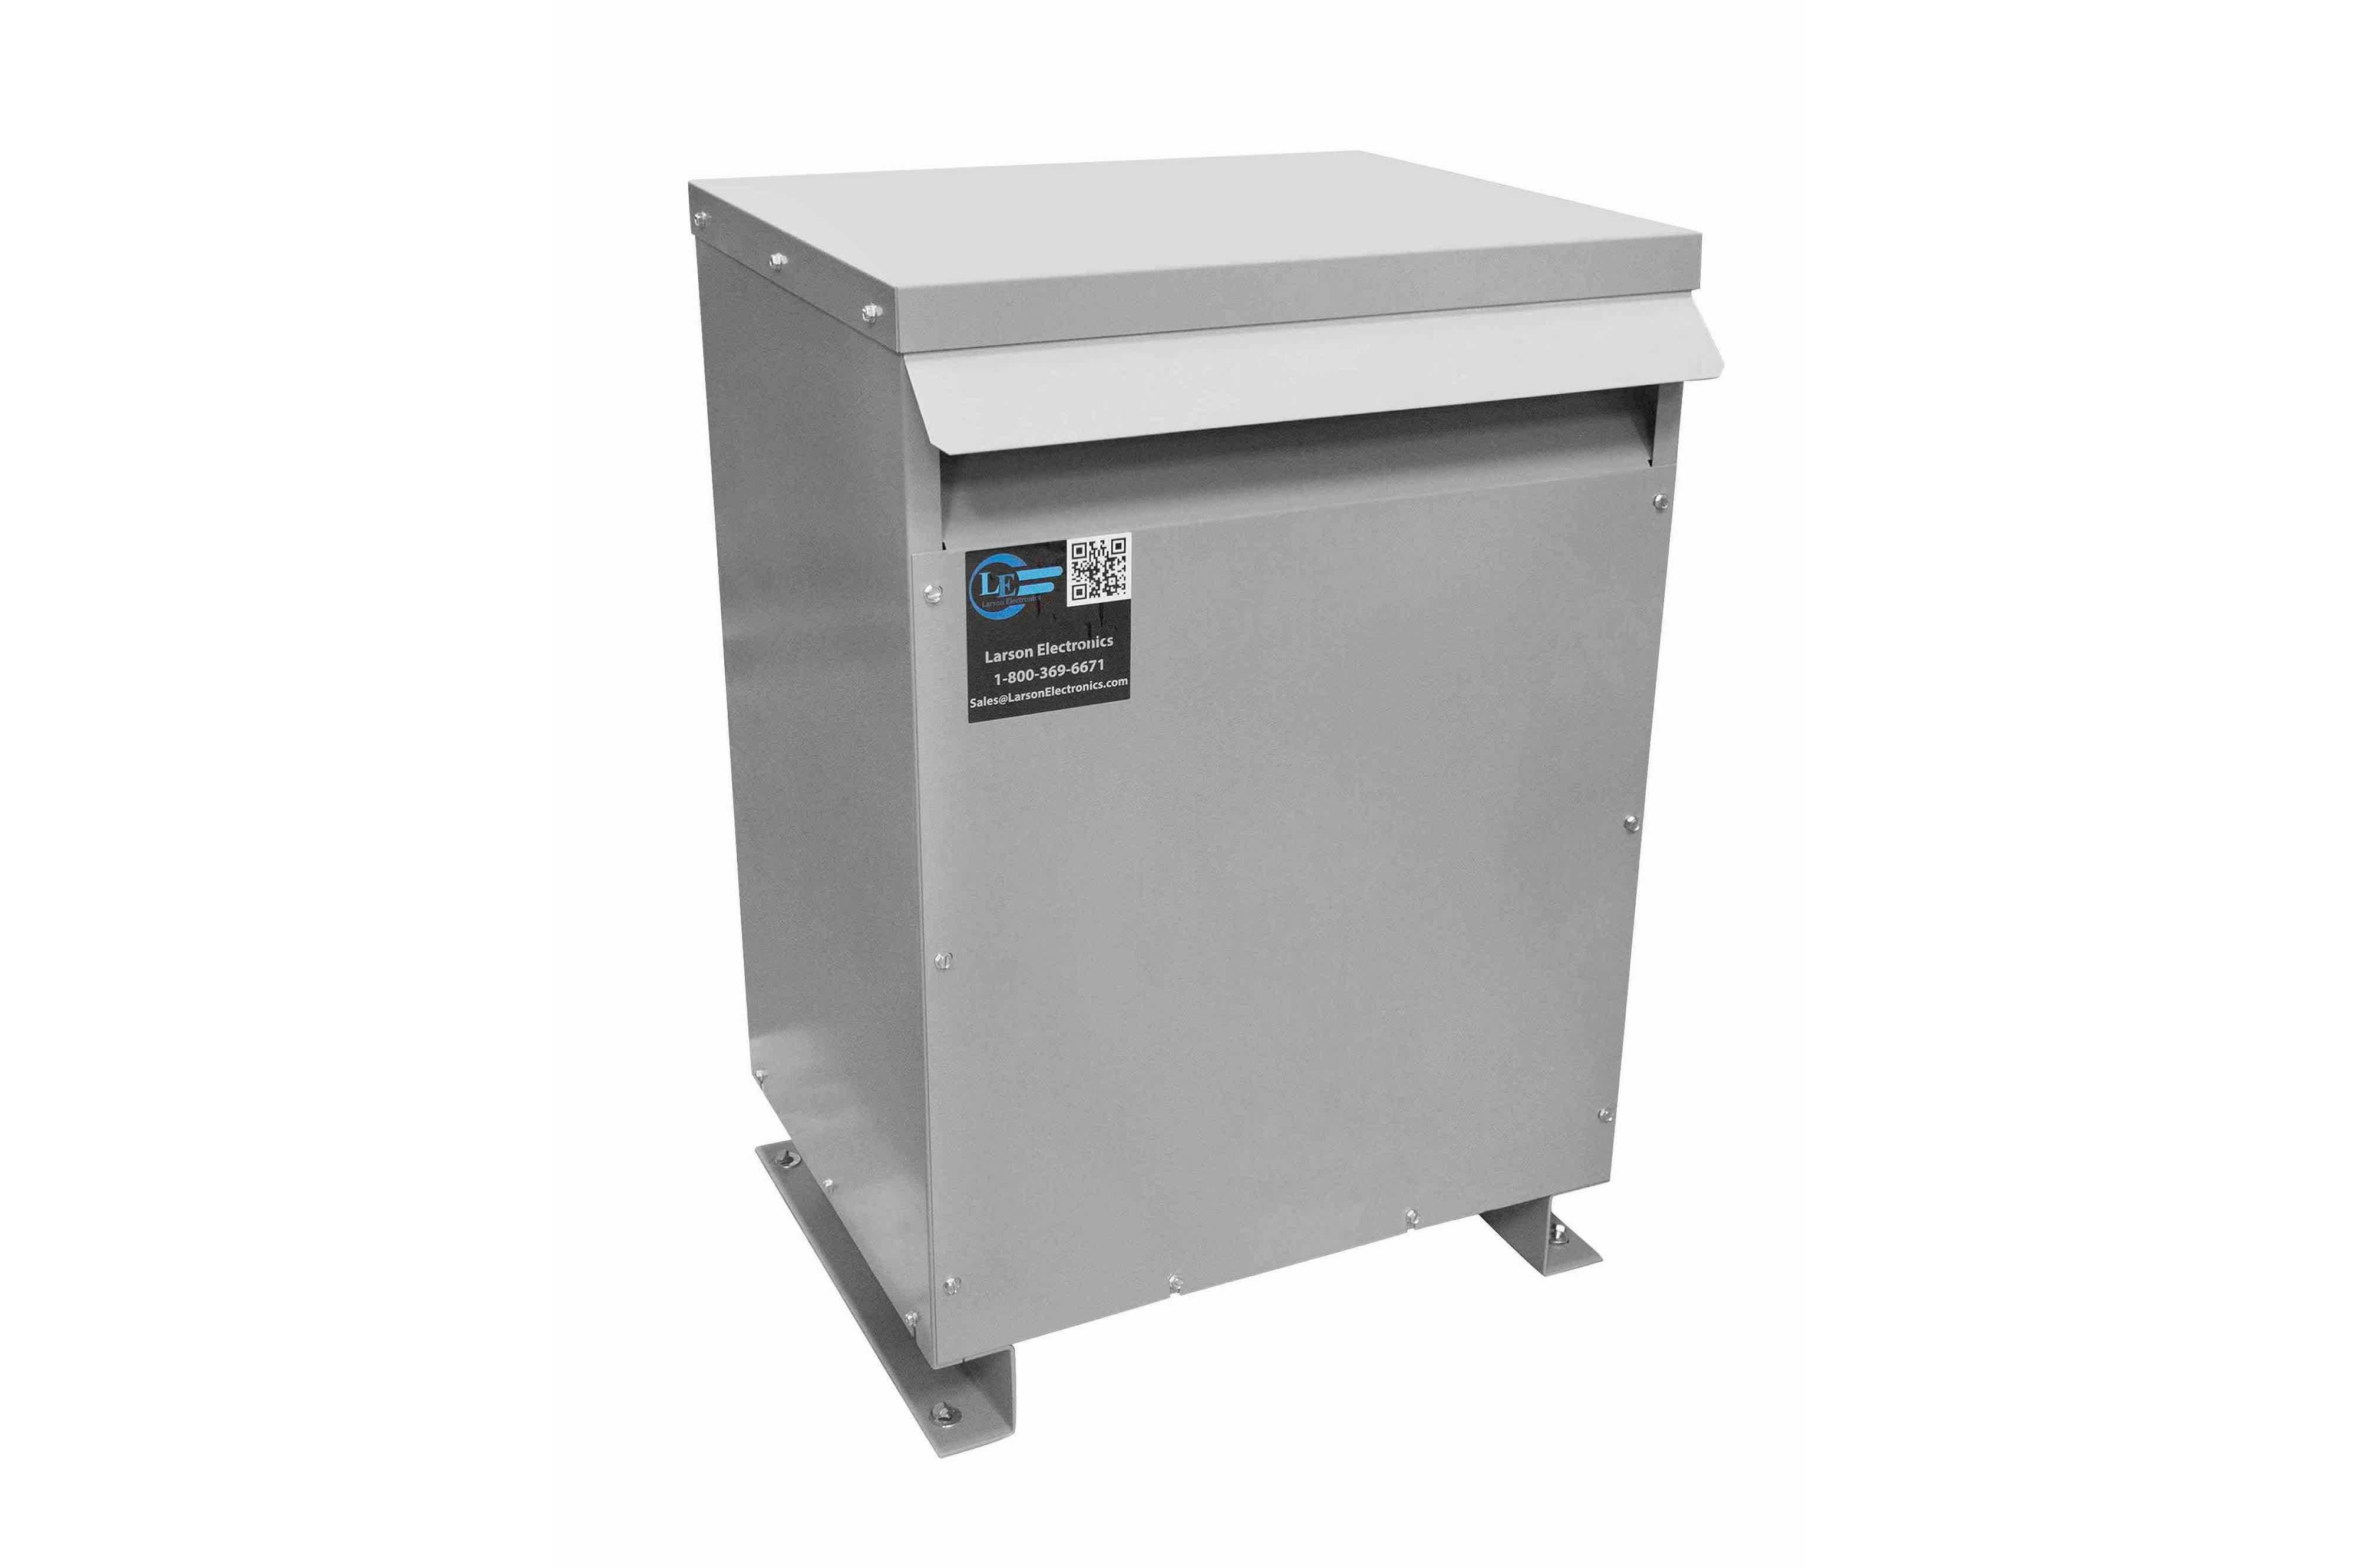 32.5 kVA 3PH Isolation Transformer, 600V Wye Primary, 400V Delta Secondary, N3R, Ventilated, 60 Hz